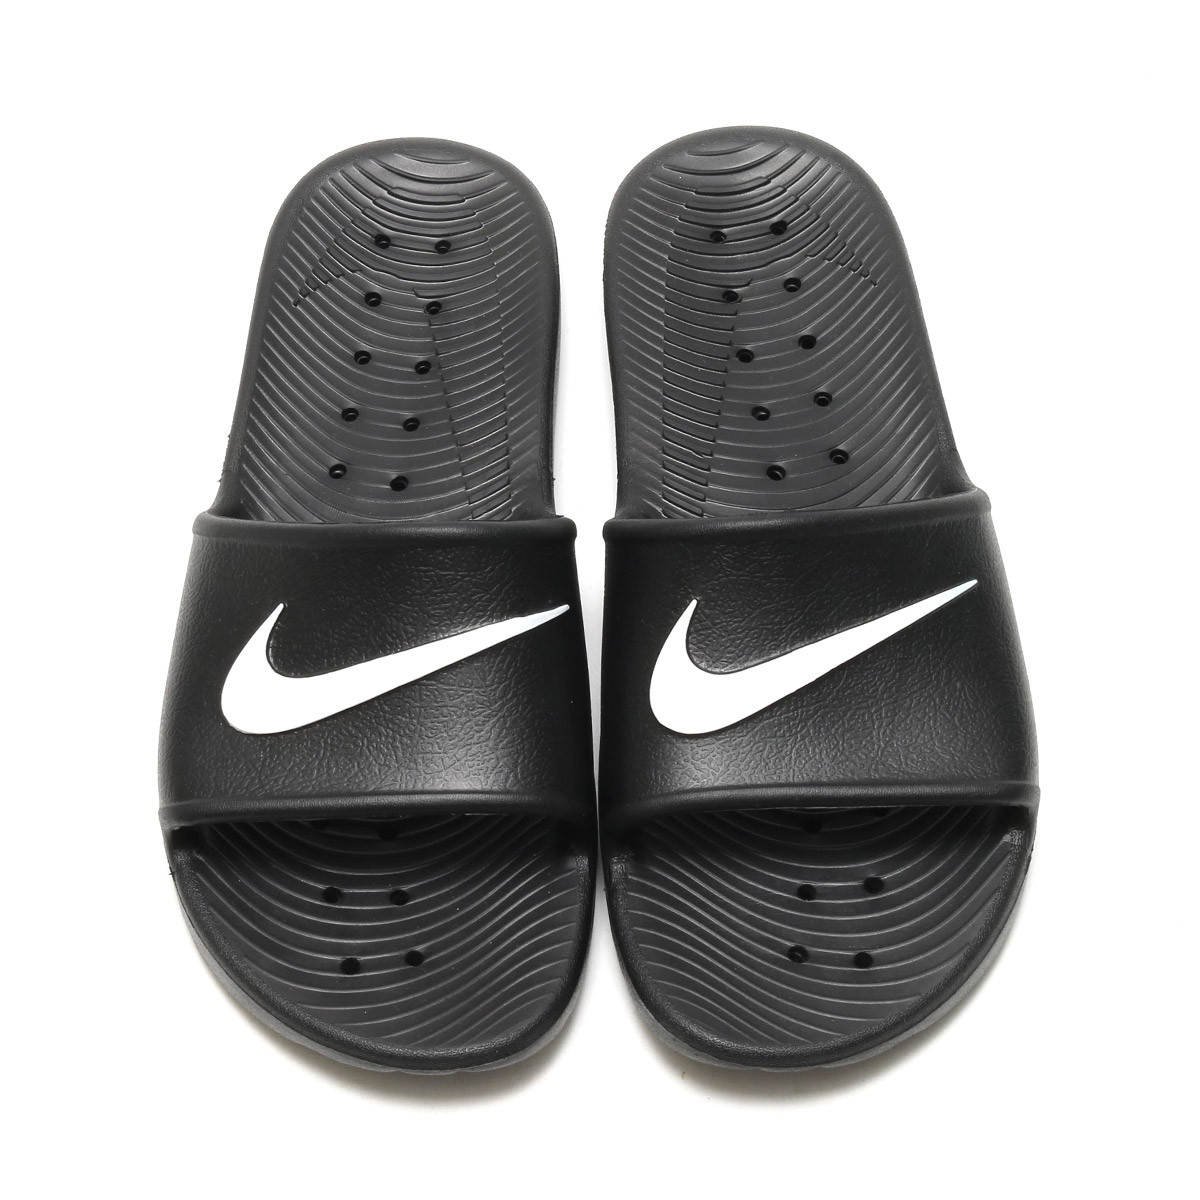 3190b014bf0f Тапочки Nike Kawa Shower 832528-001 (Оригинал)